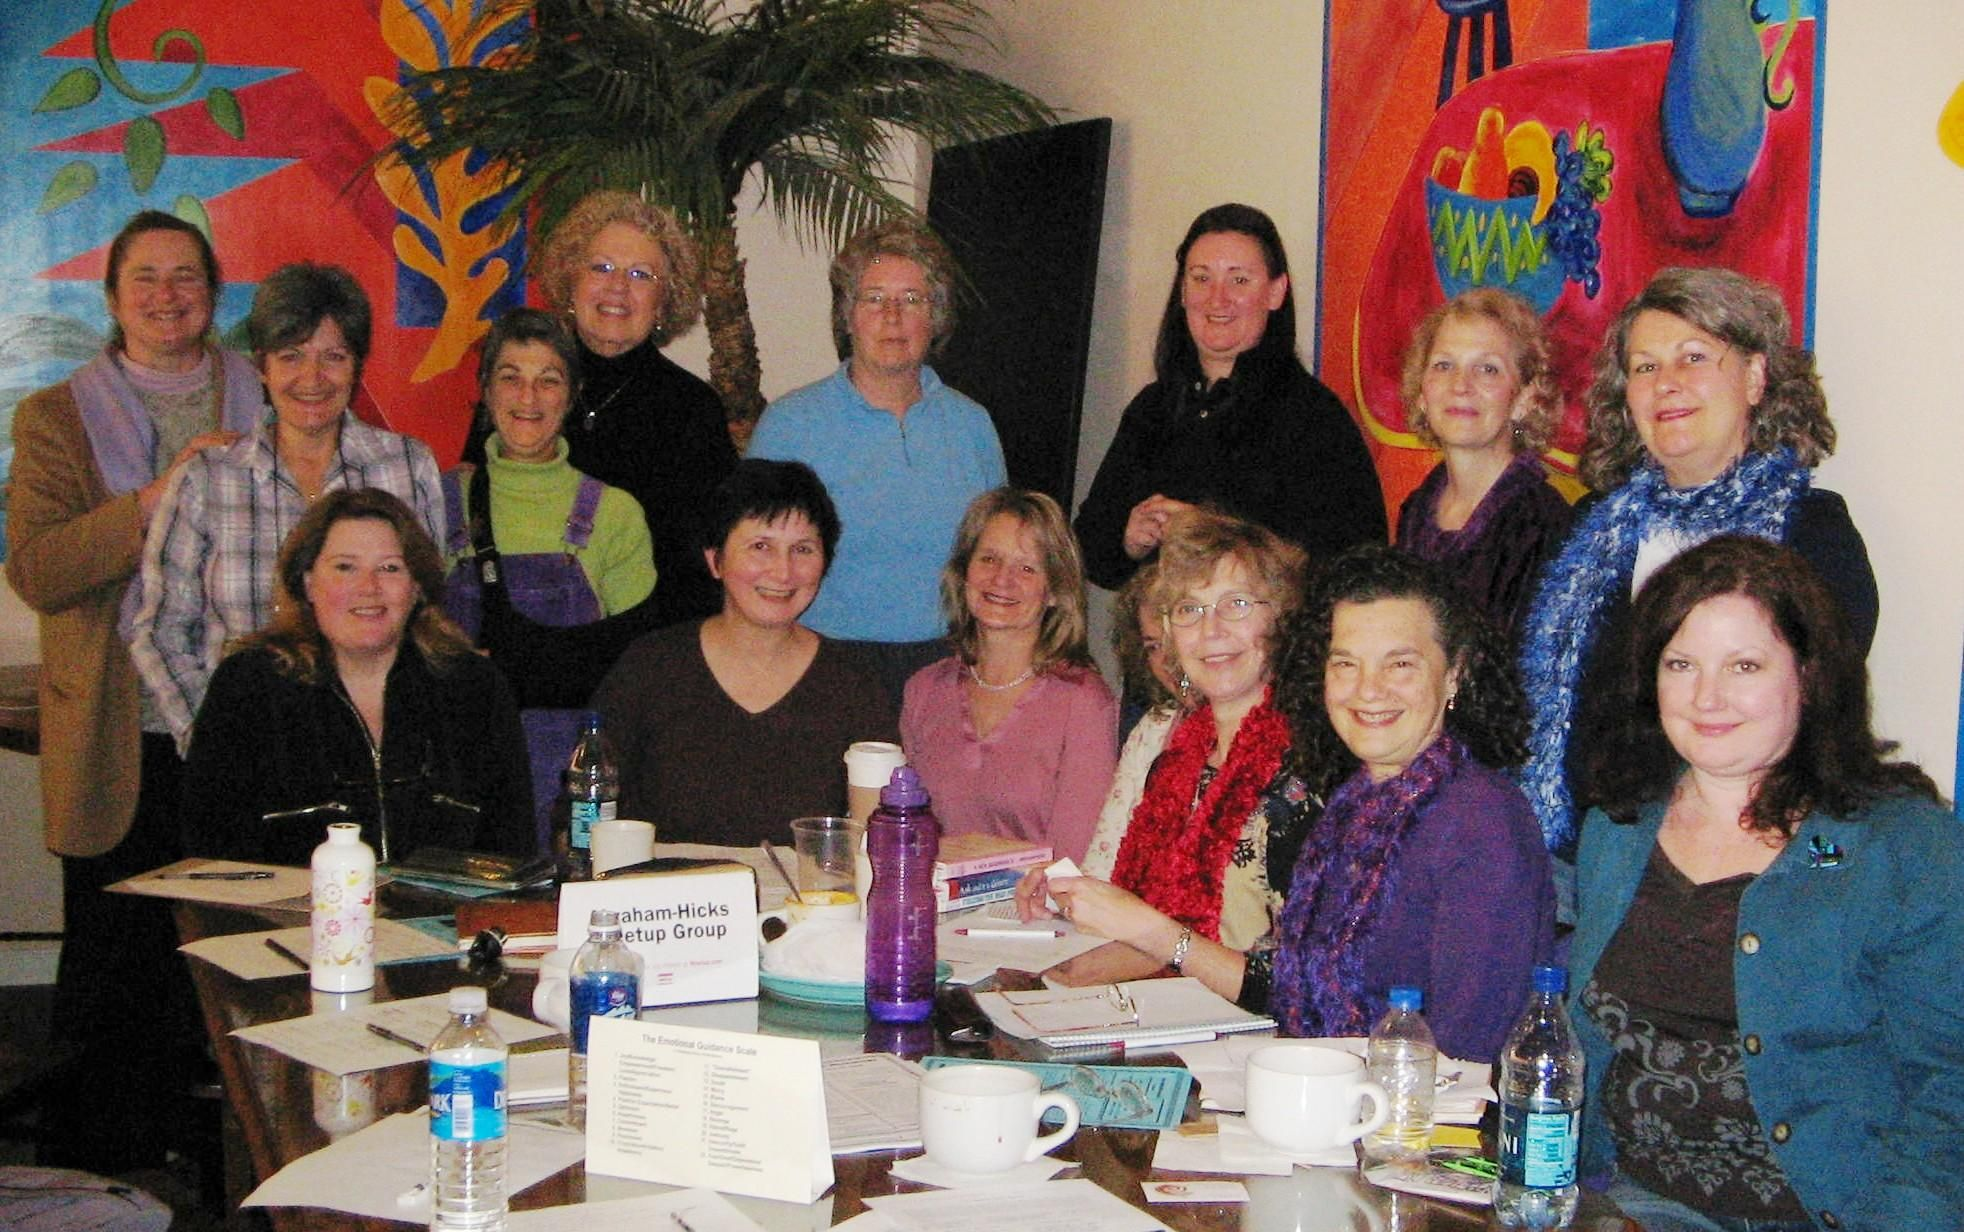 Charlottesville Abraham Hicks Meetup Group